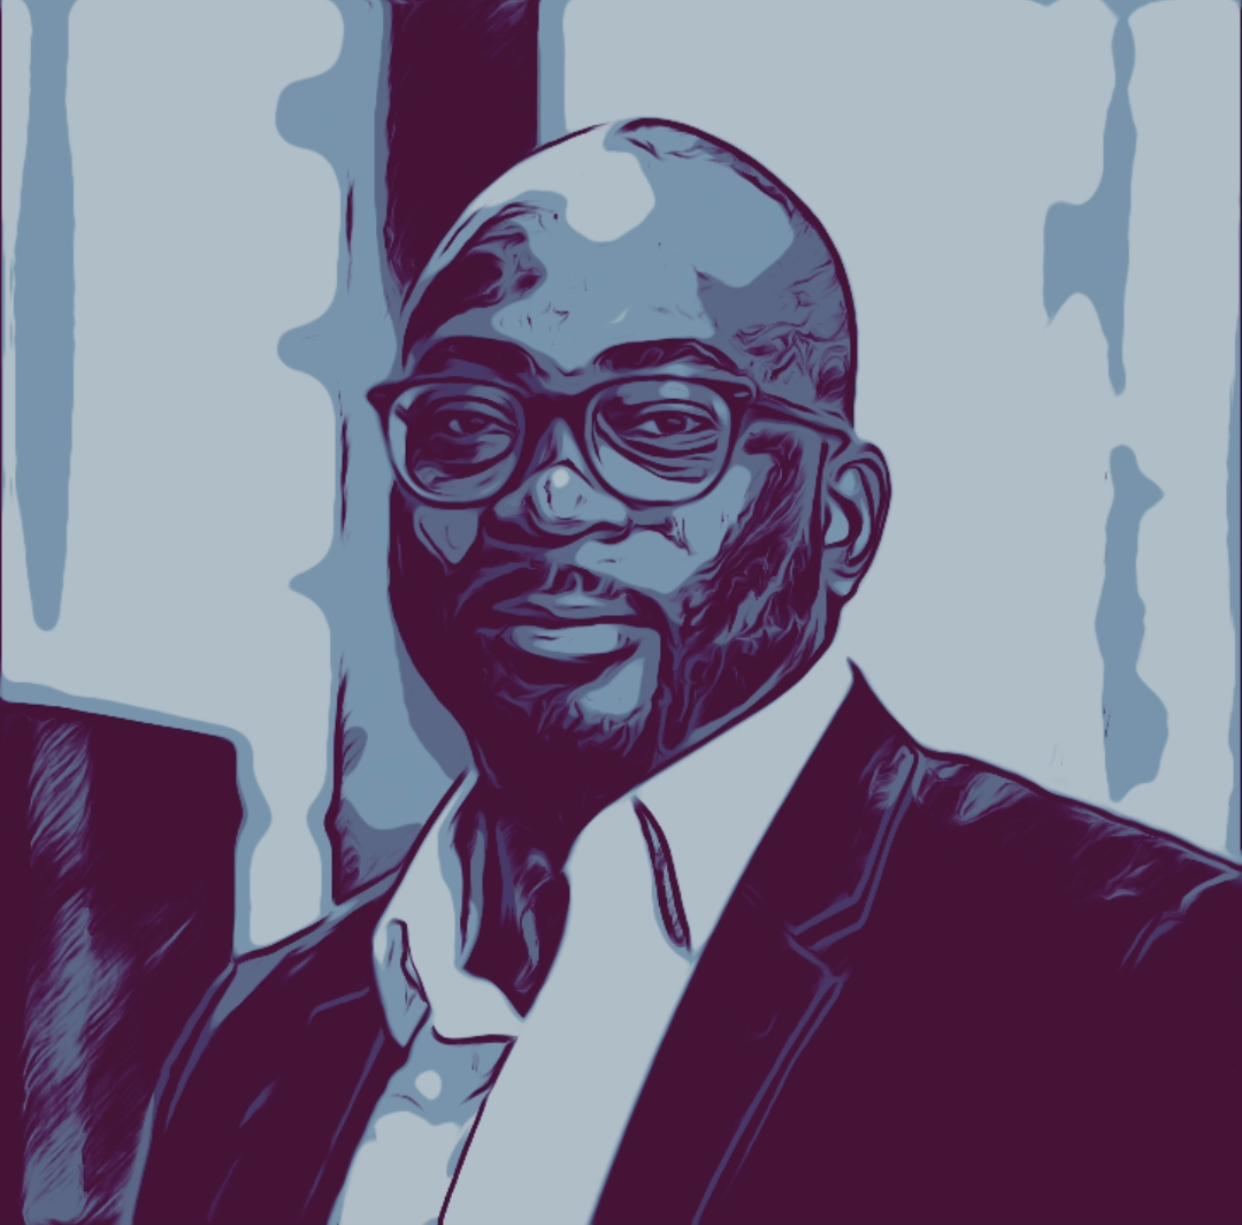 Anthony Ajose, Chairman, Aspuna Nigeria.